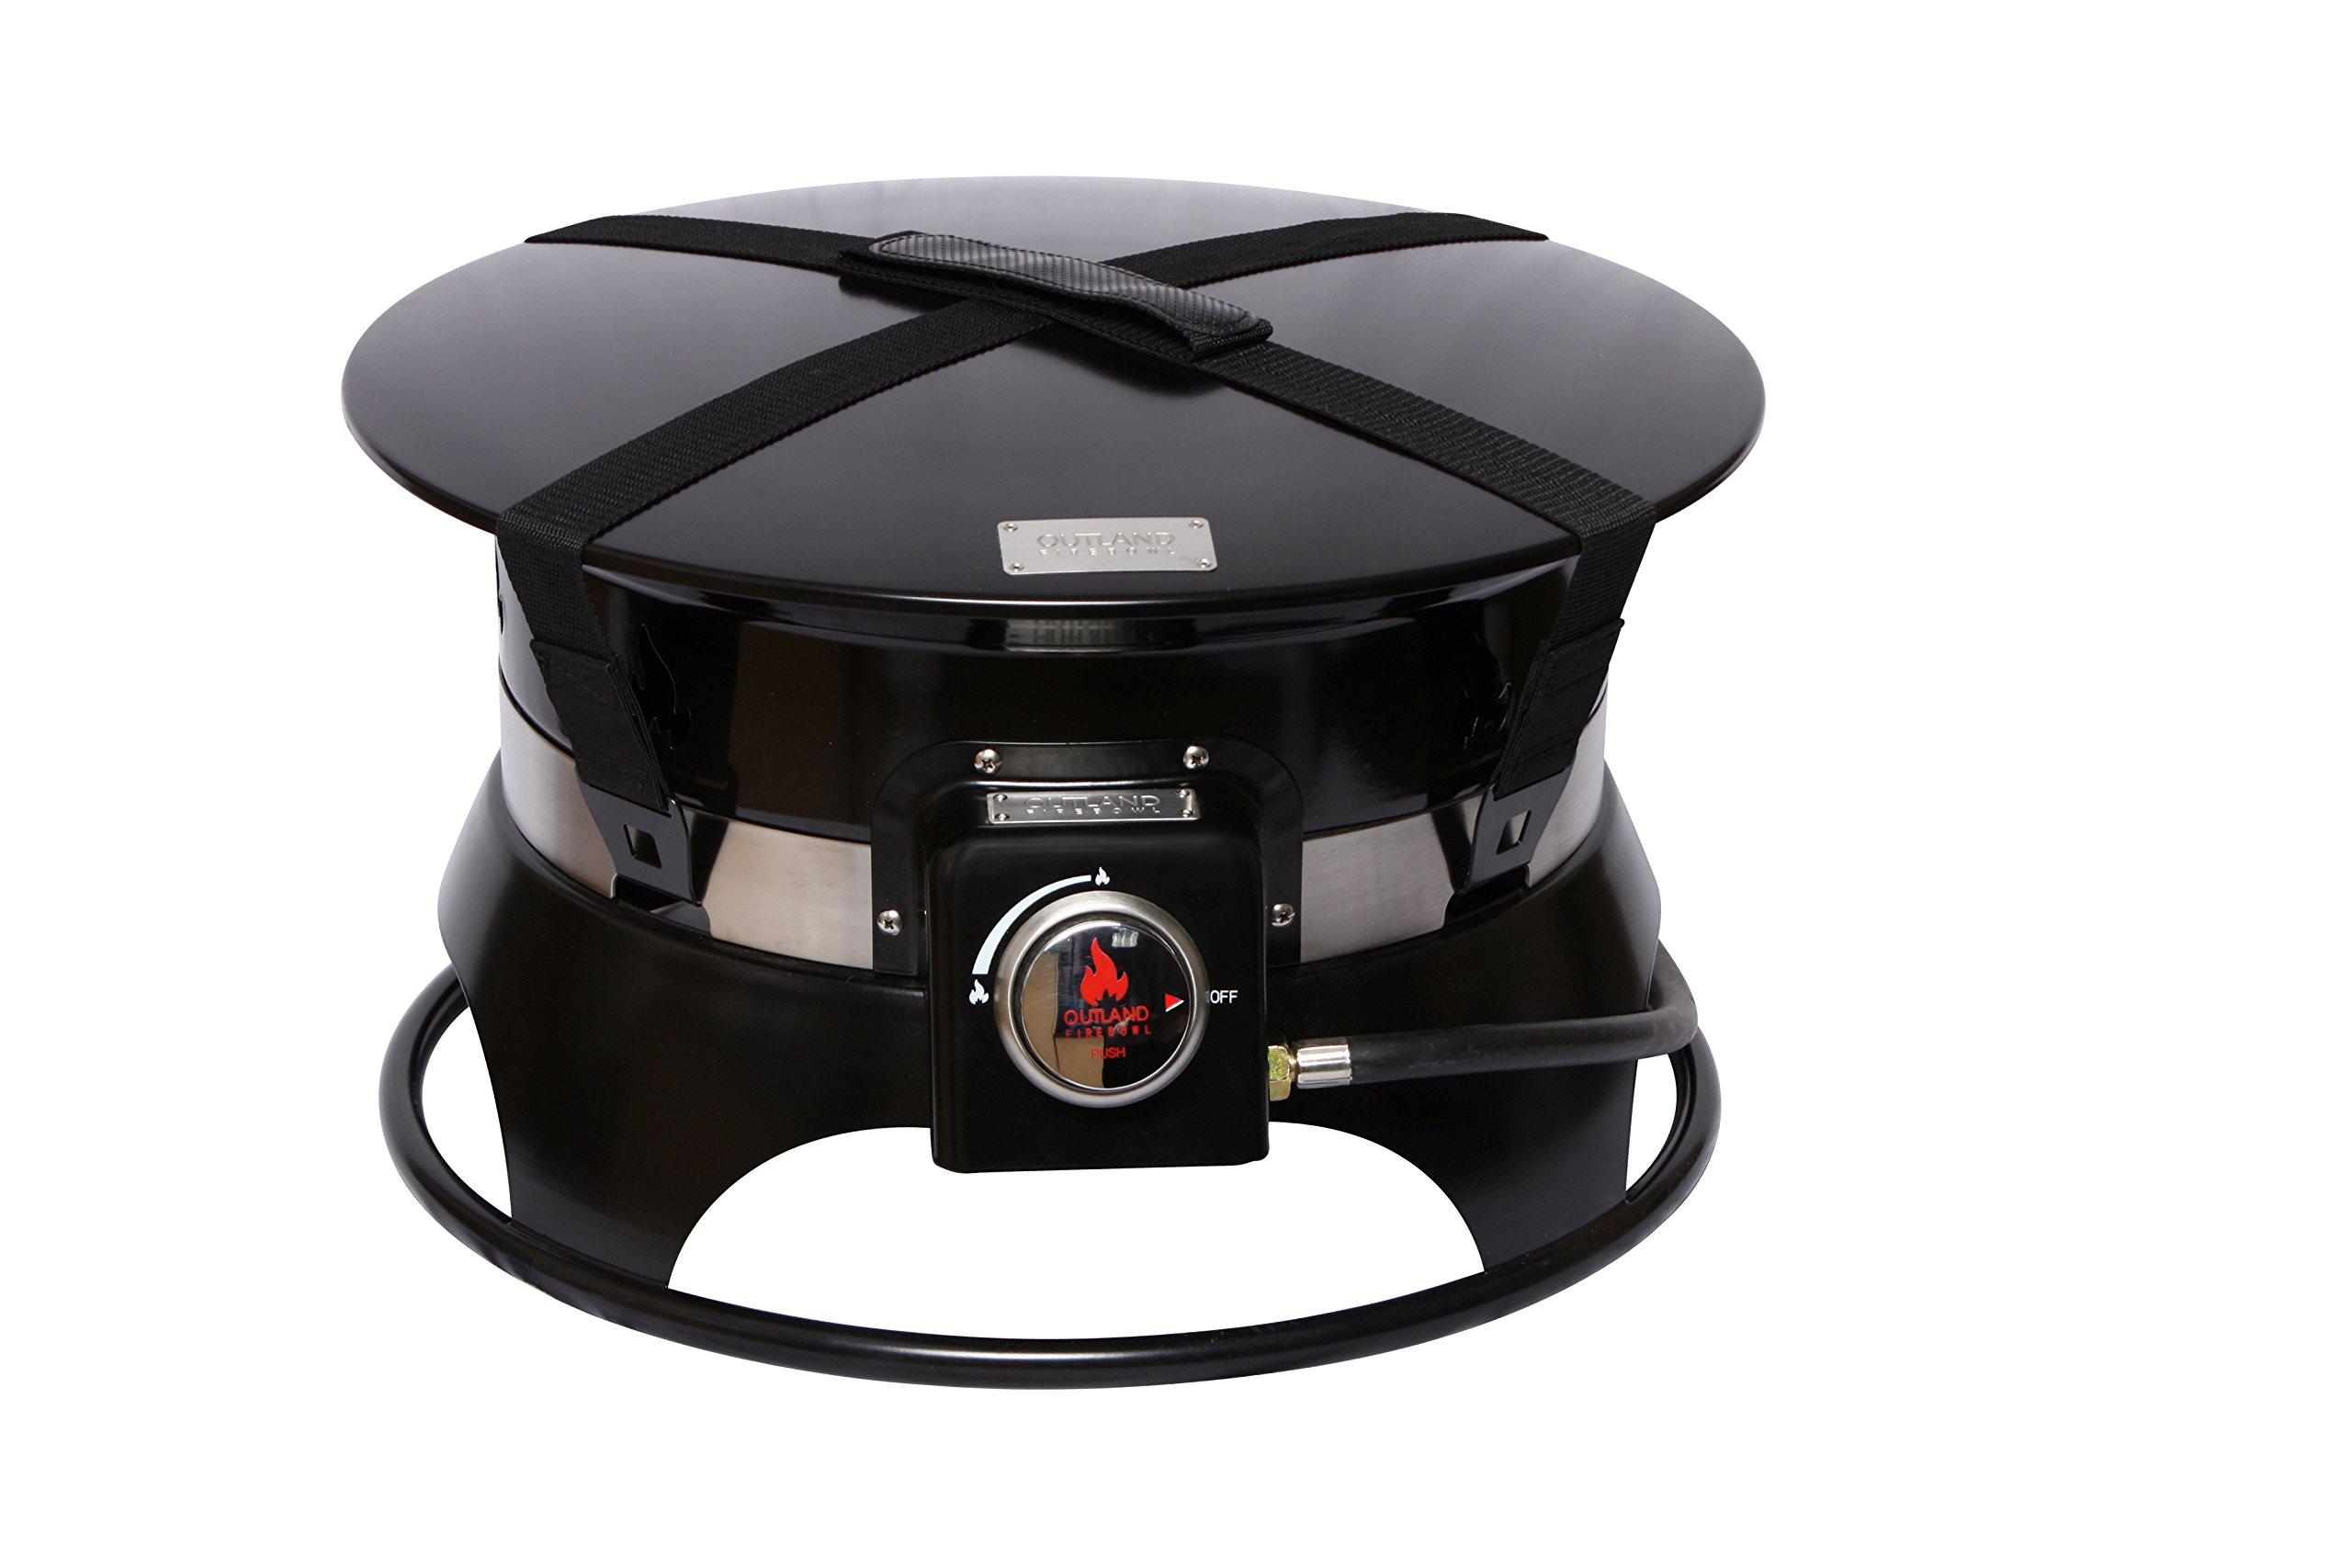 Outland Firebowl 870 Premium Portable Propane Gas Fire Pit ... on Outland Firebowl Propane Fire Pit id=48185